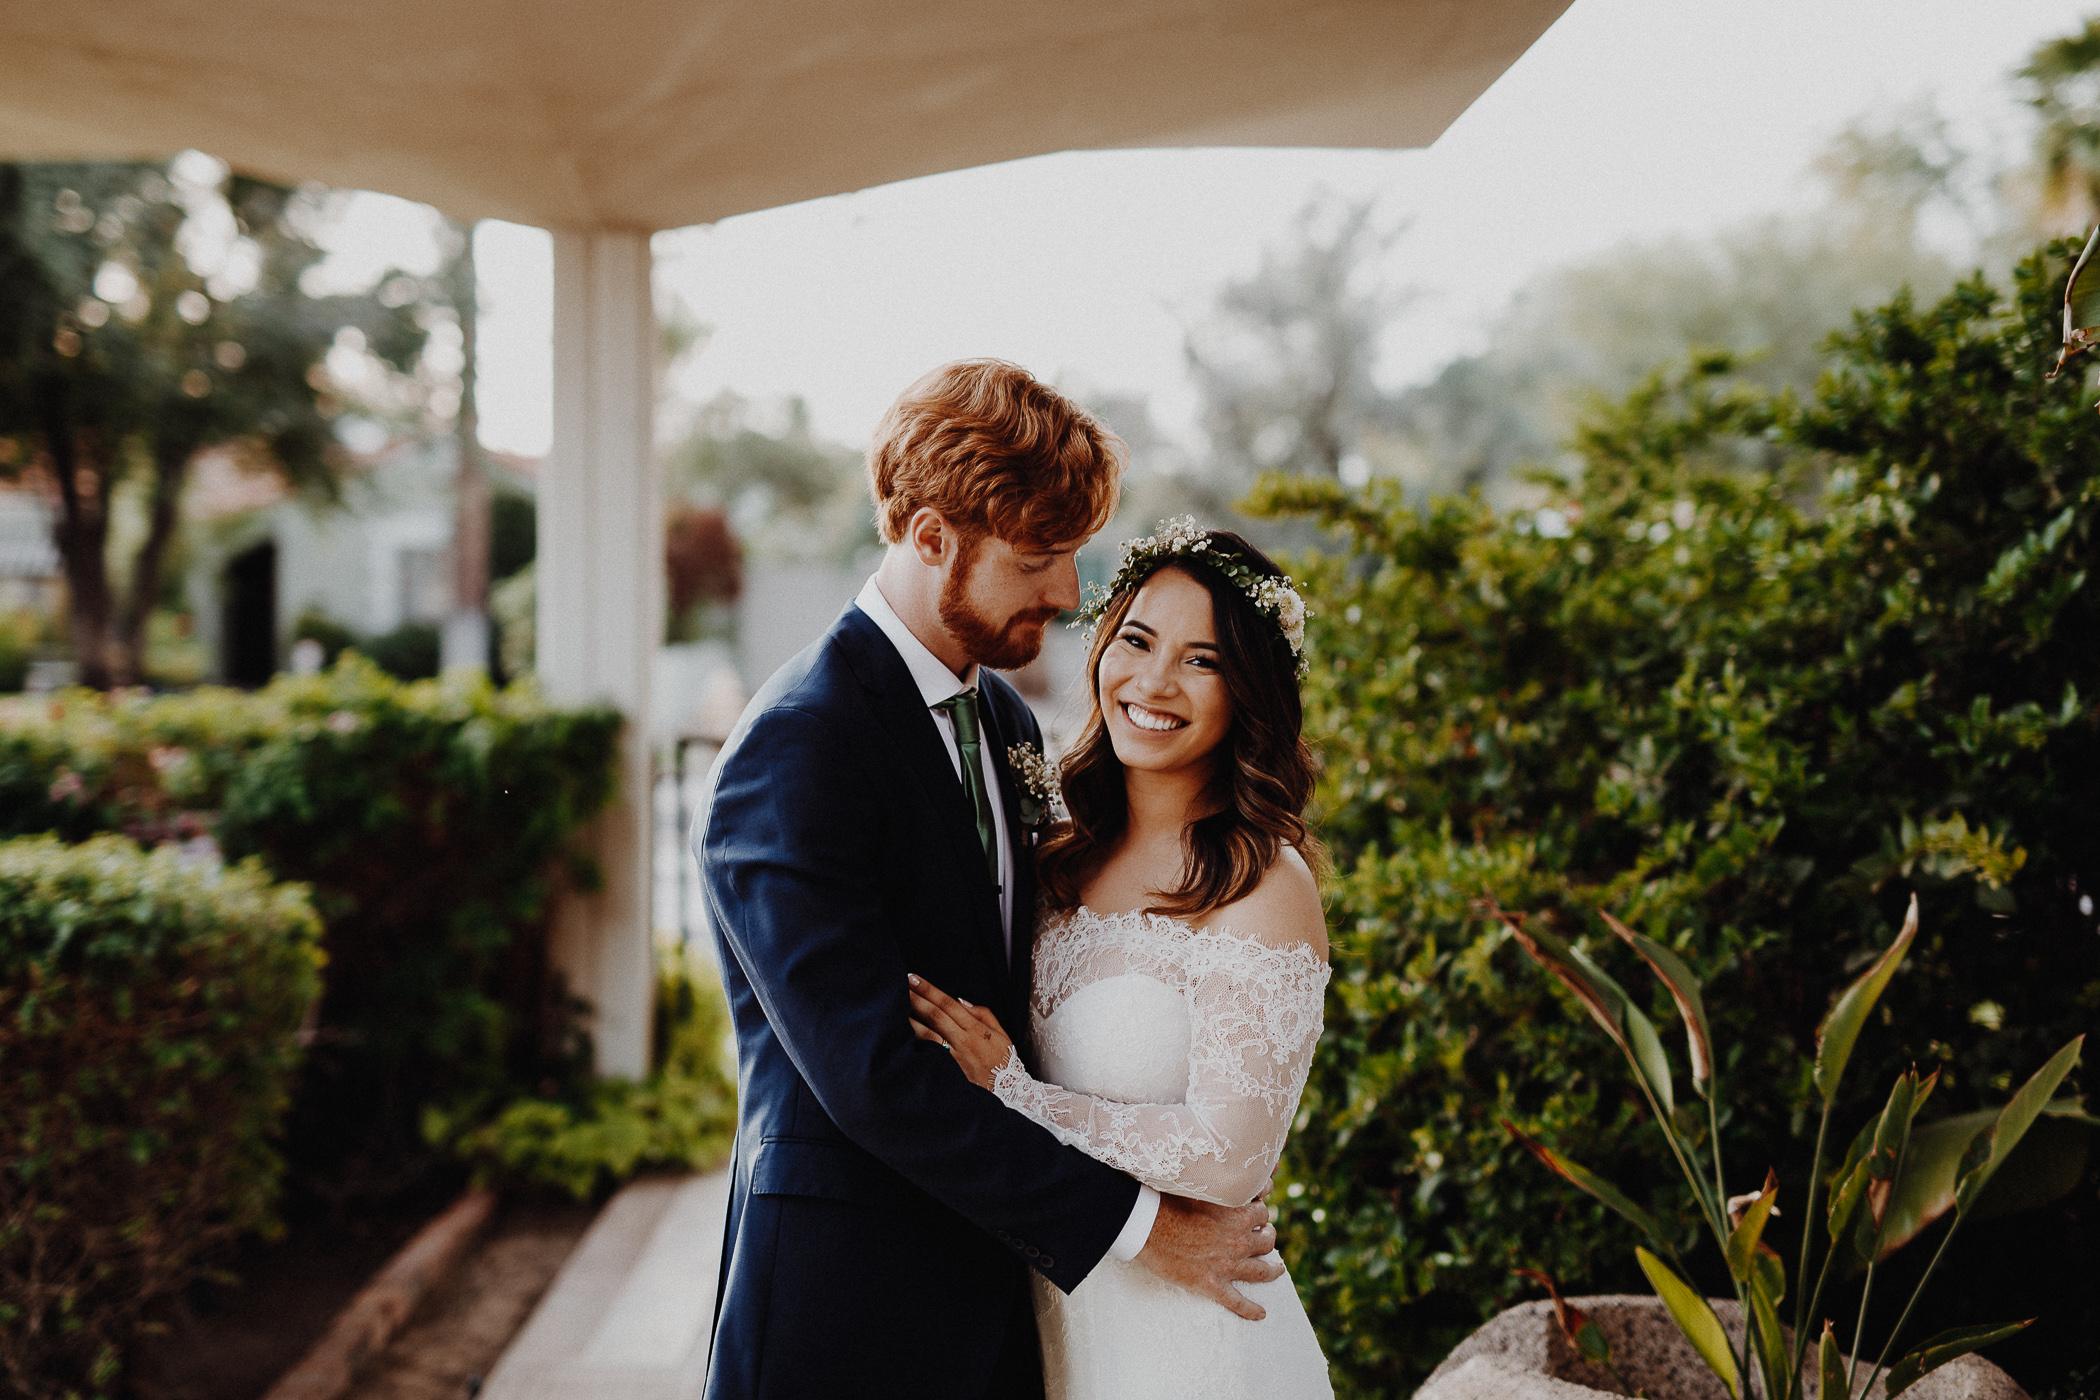 181104-Luxium-Weddings-Arizona-@matt__Le-Brandon-Kariana-Phoenix-Valley-Garden-Center-1101.jpg